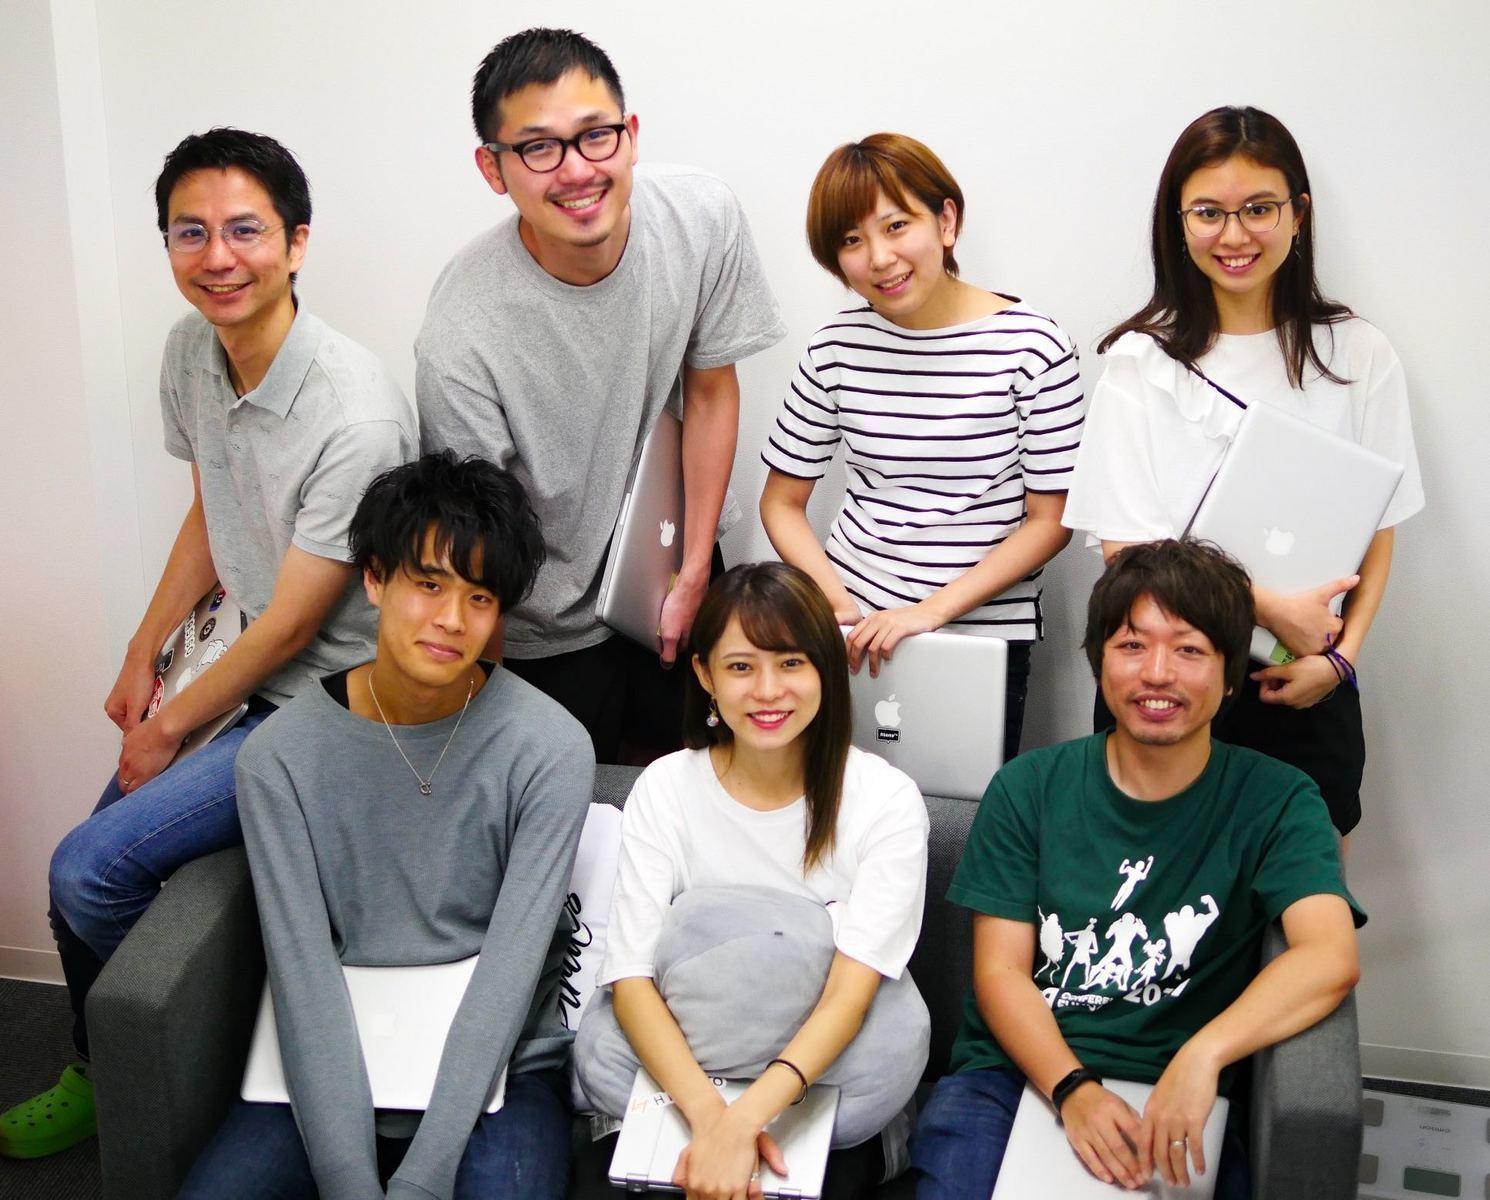 【Node.js】U・Iターン歓迎!サイバーエージェント子会社が福岡で働くNode.jsエンジニアを大募集!